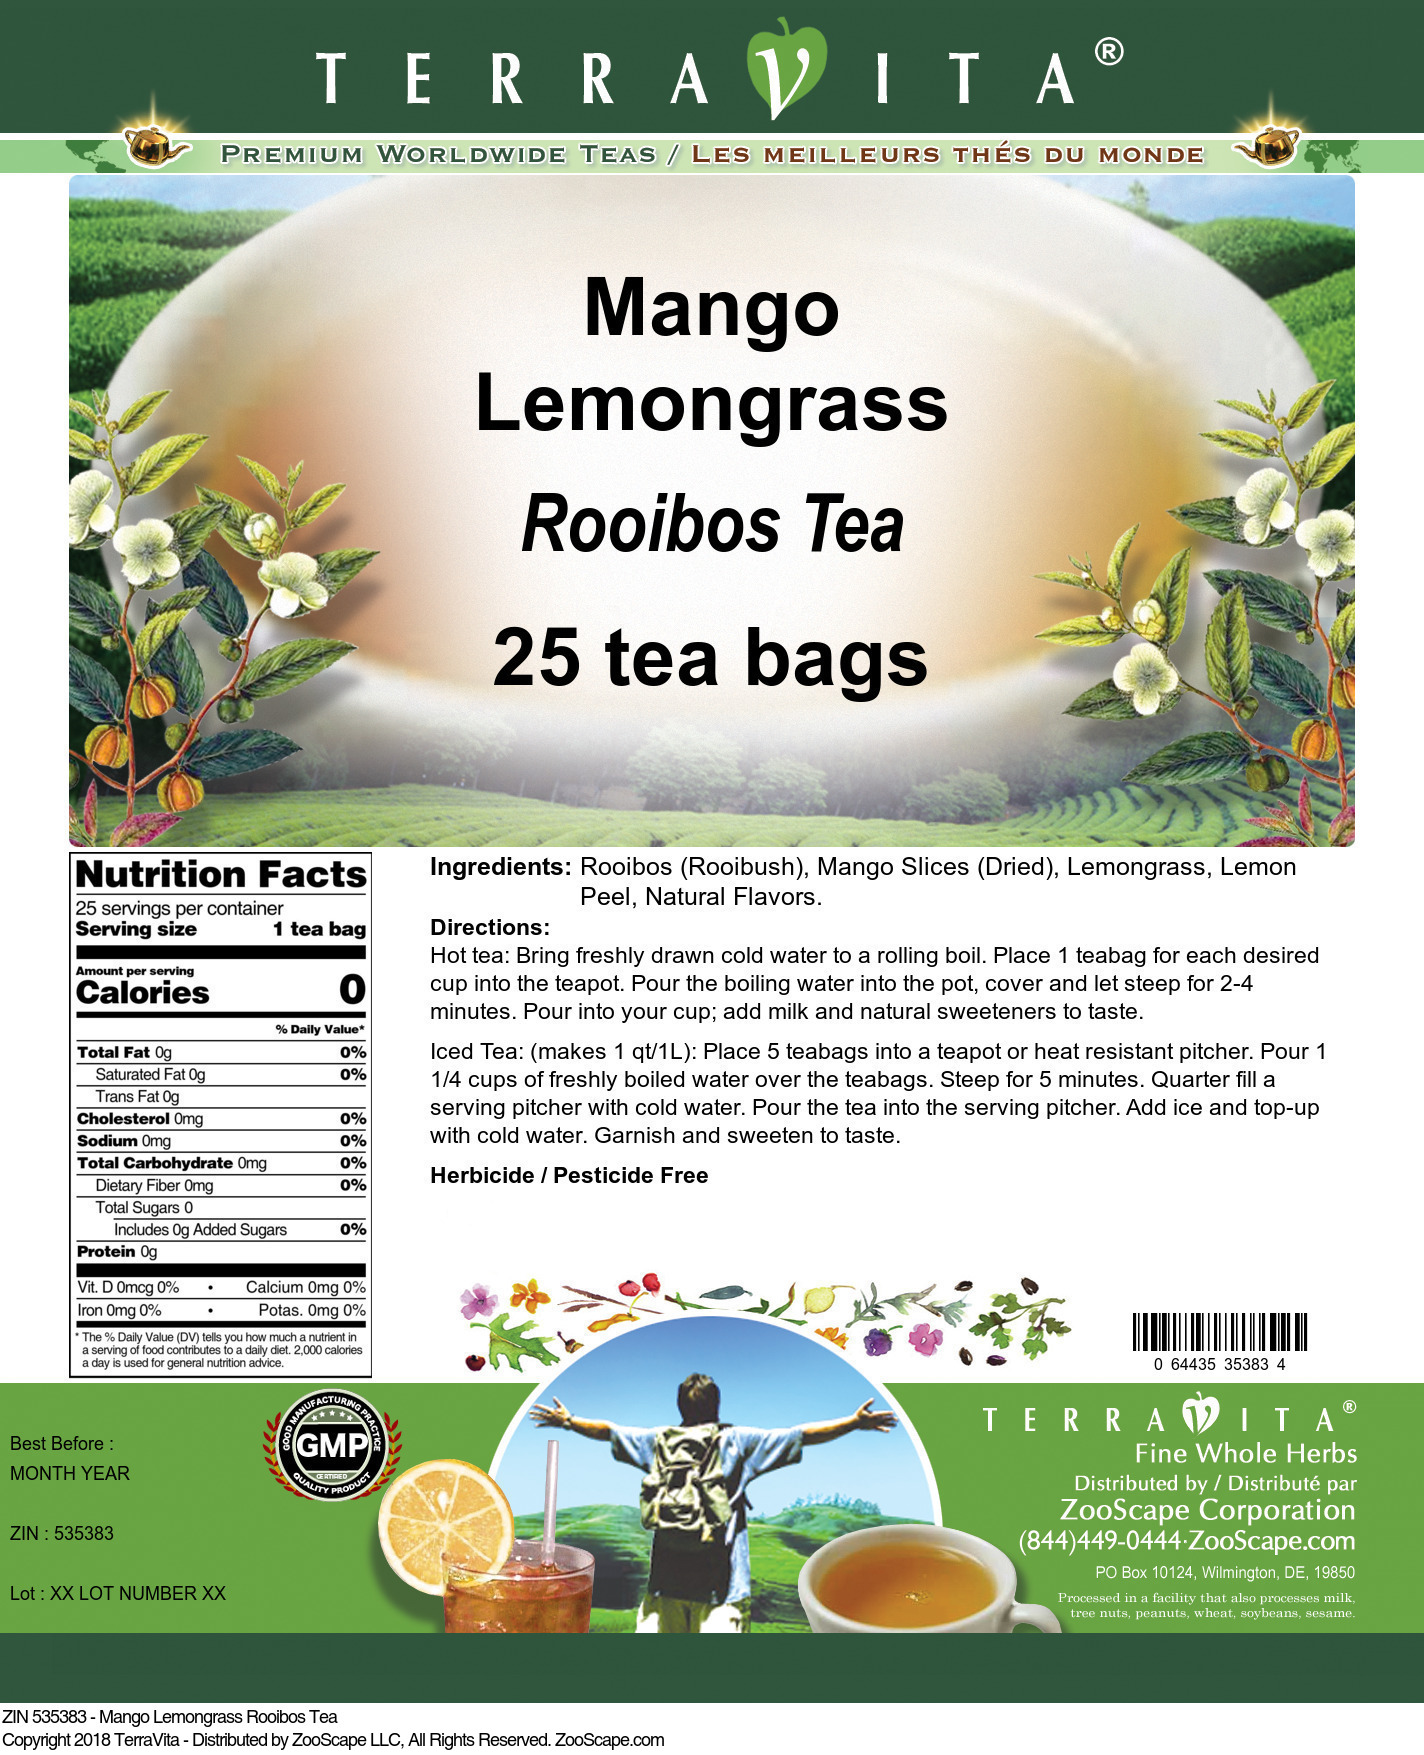 Mango Lemongrass Rooibos Tea